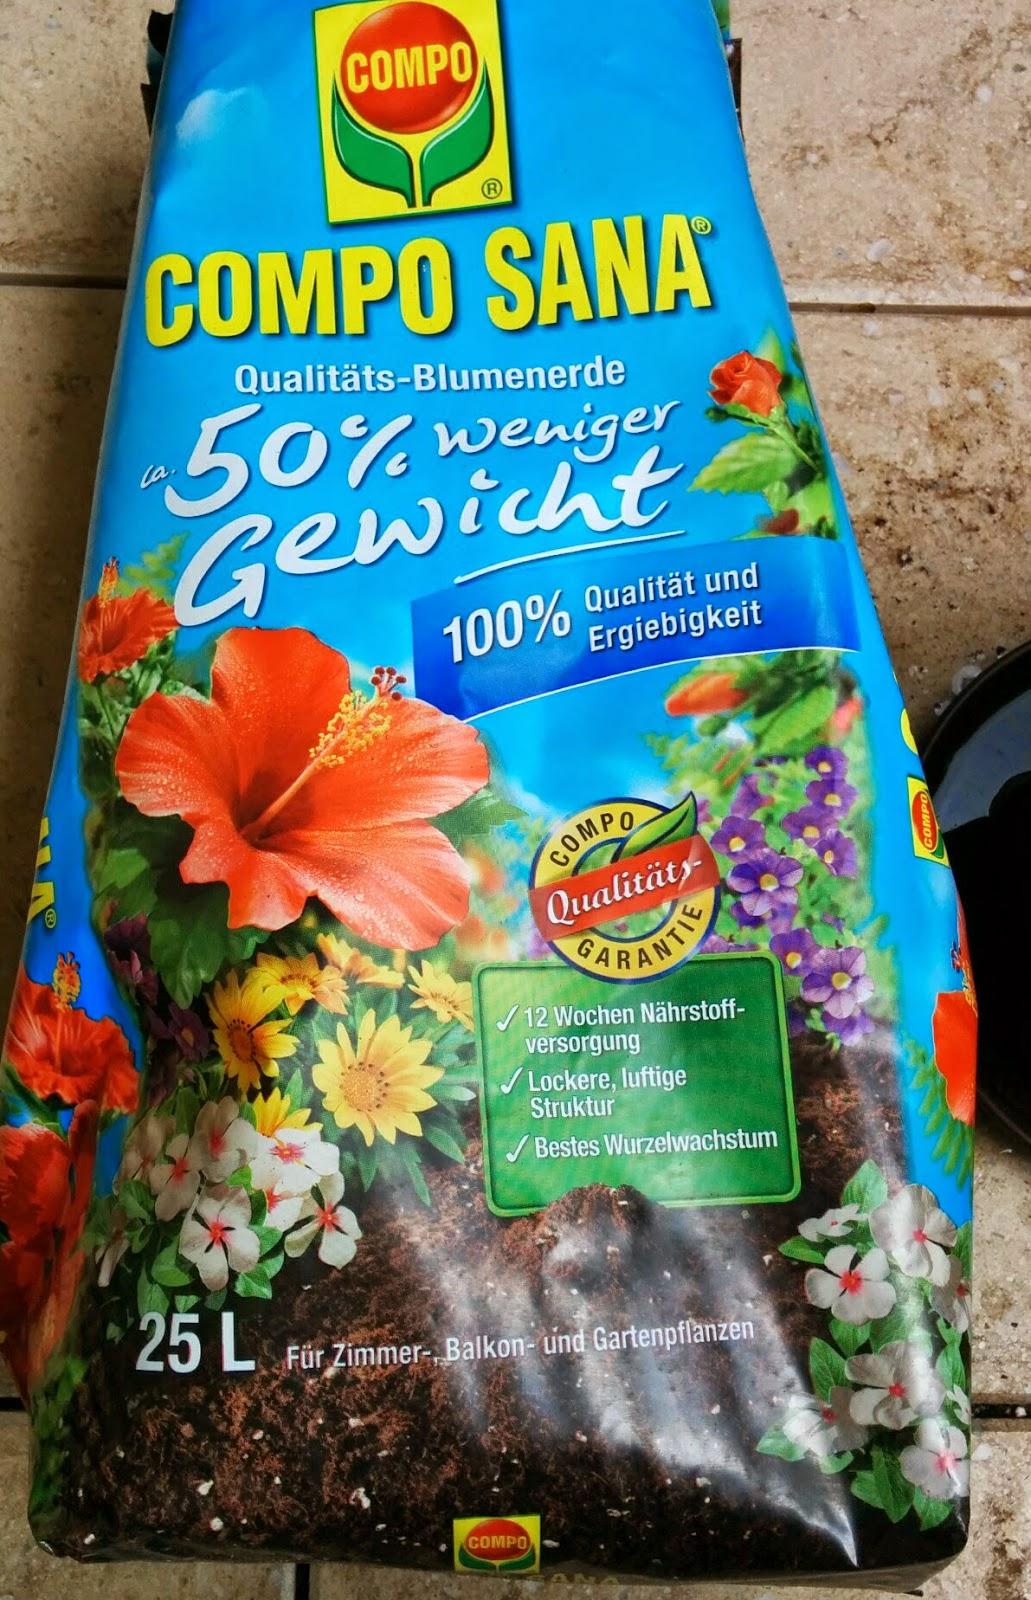 composana compact 50 % weniger gewicht